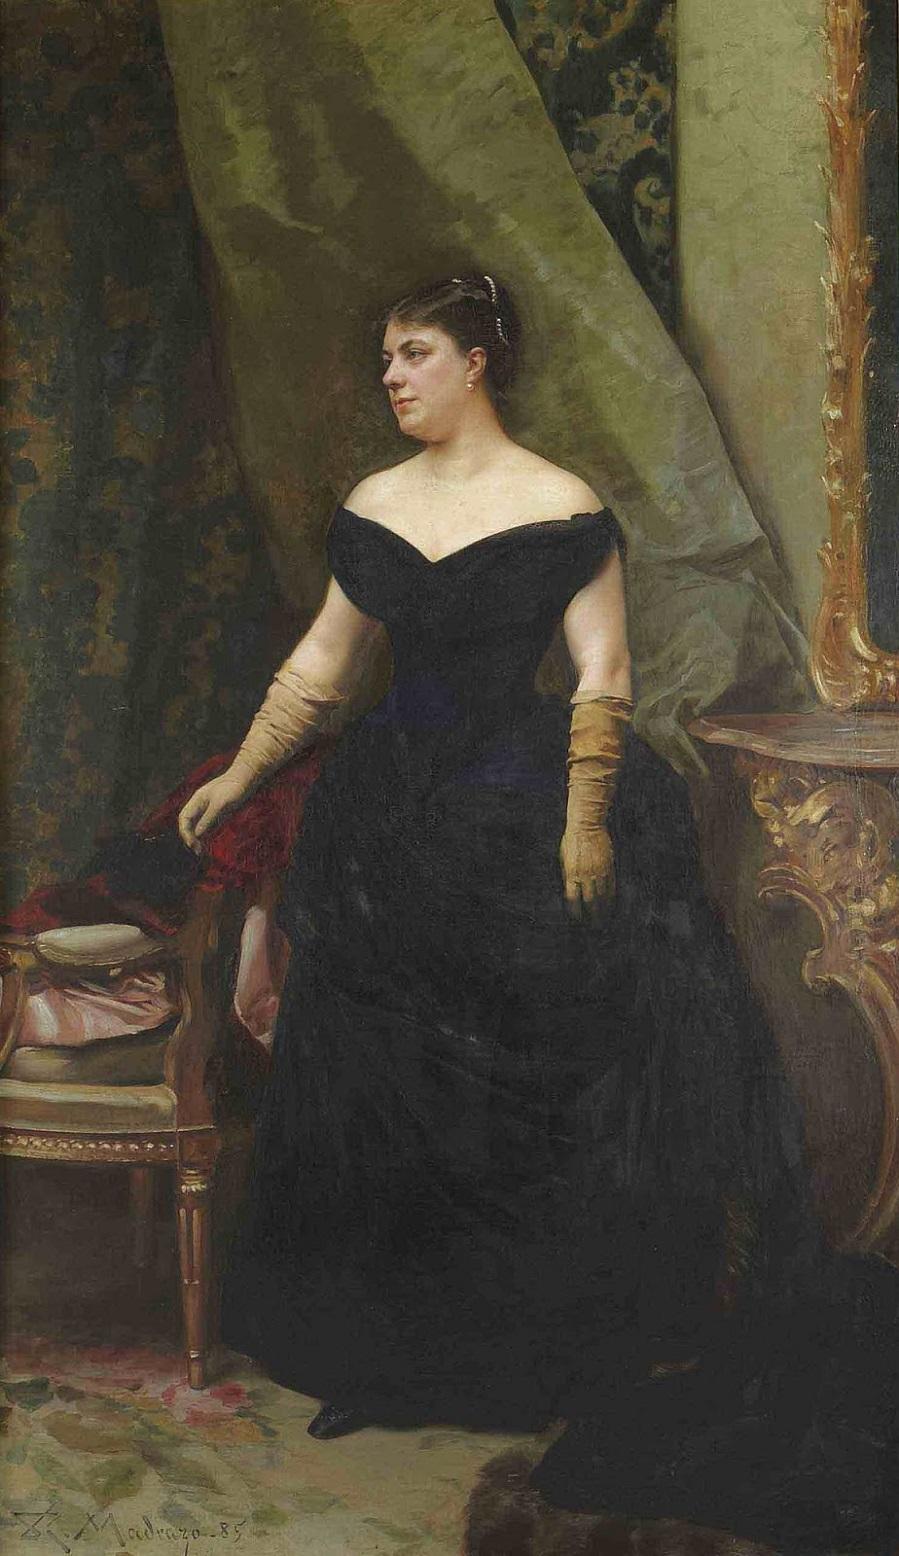 1885_Портрет мадам Исаак Хирш-Канн (Portrait de madame Isaac Hirsch Kann, nee Koenigswarter)_40 x 132_х.,м._Частное собрание.jpg